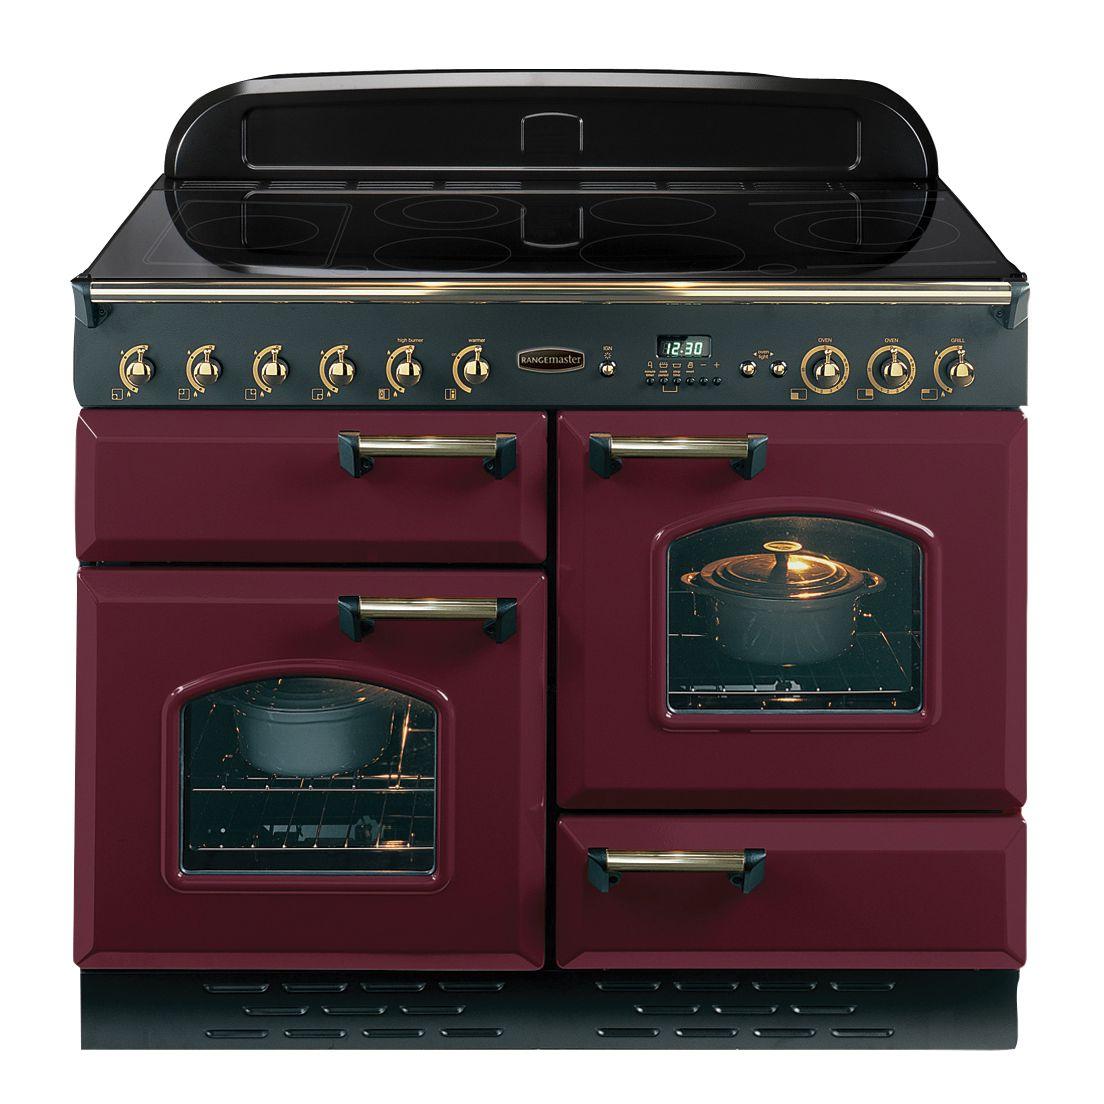 Rangemaster Classic 110 Electric Range Cooker CranberryBrass Trim